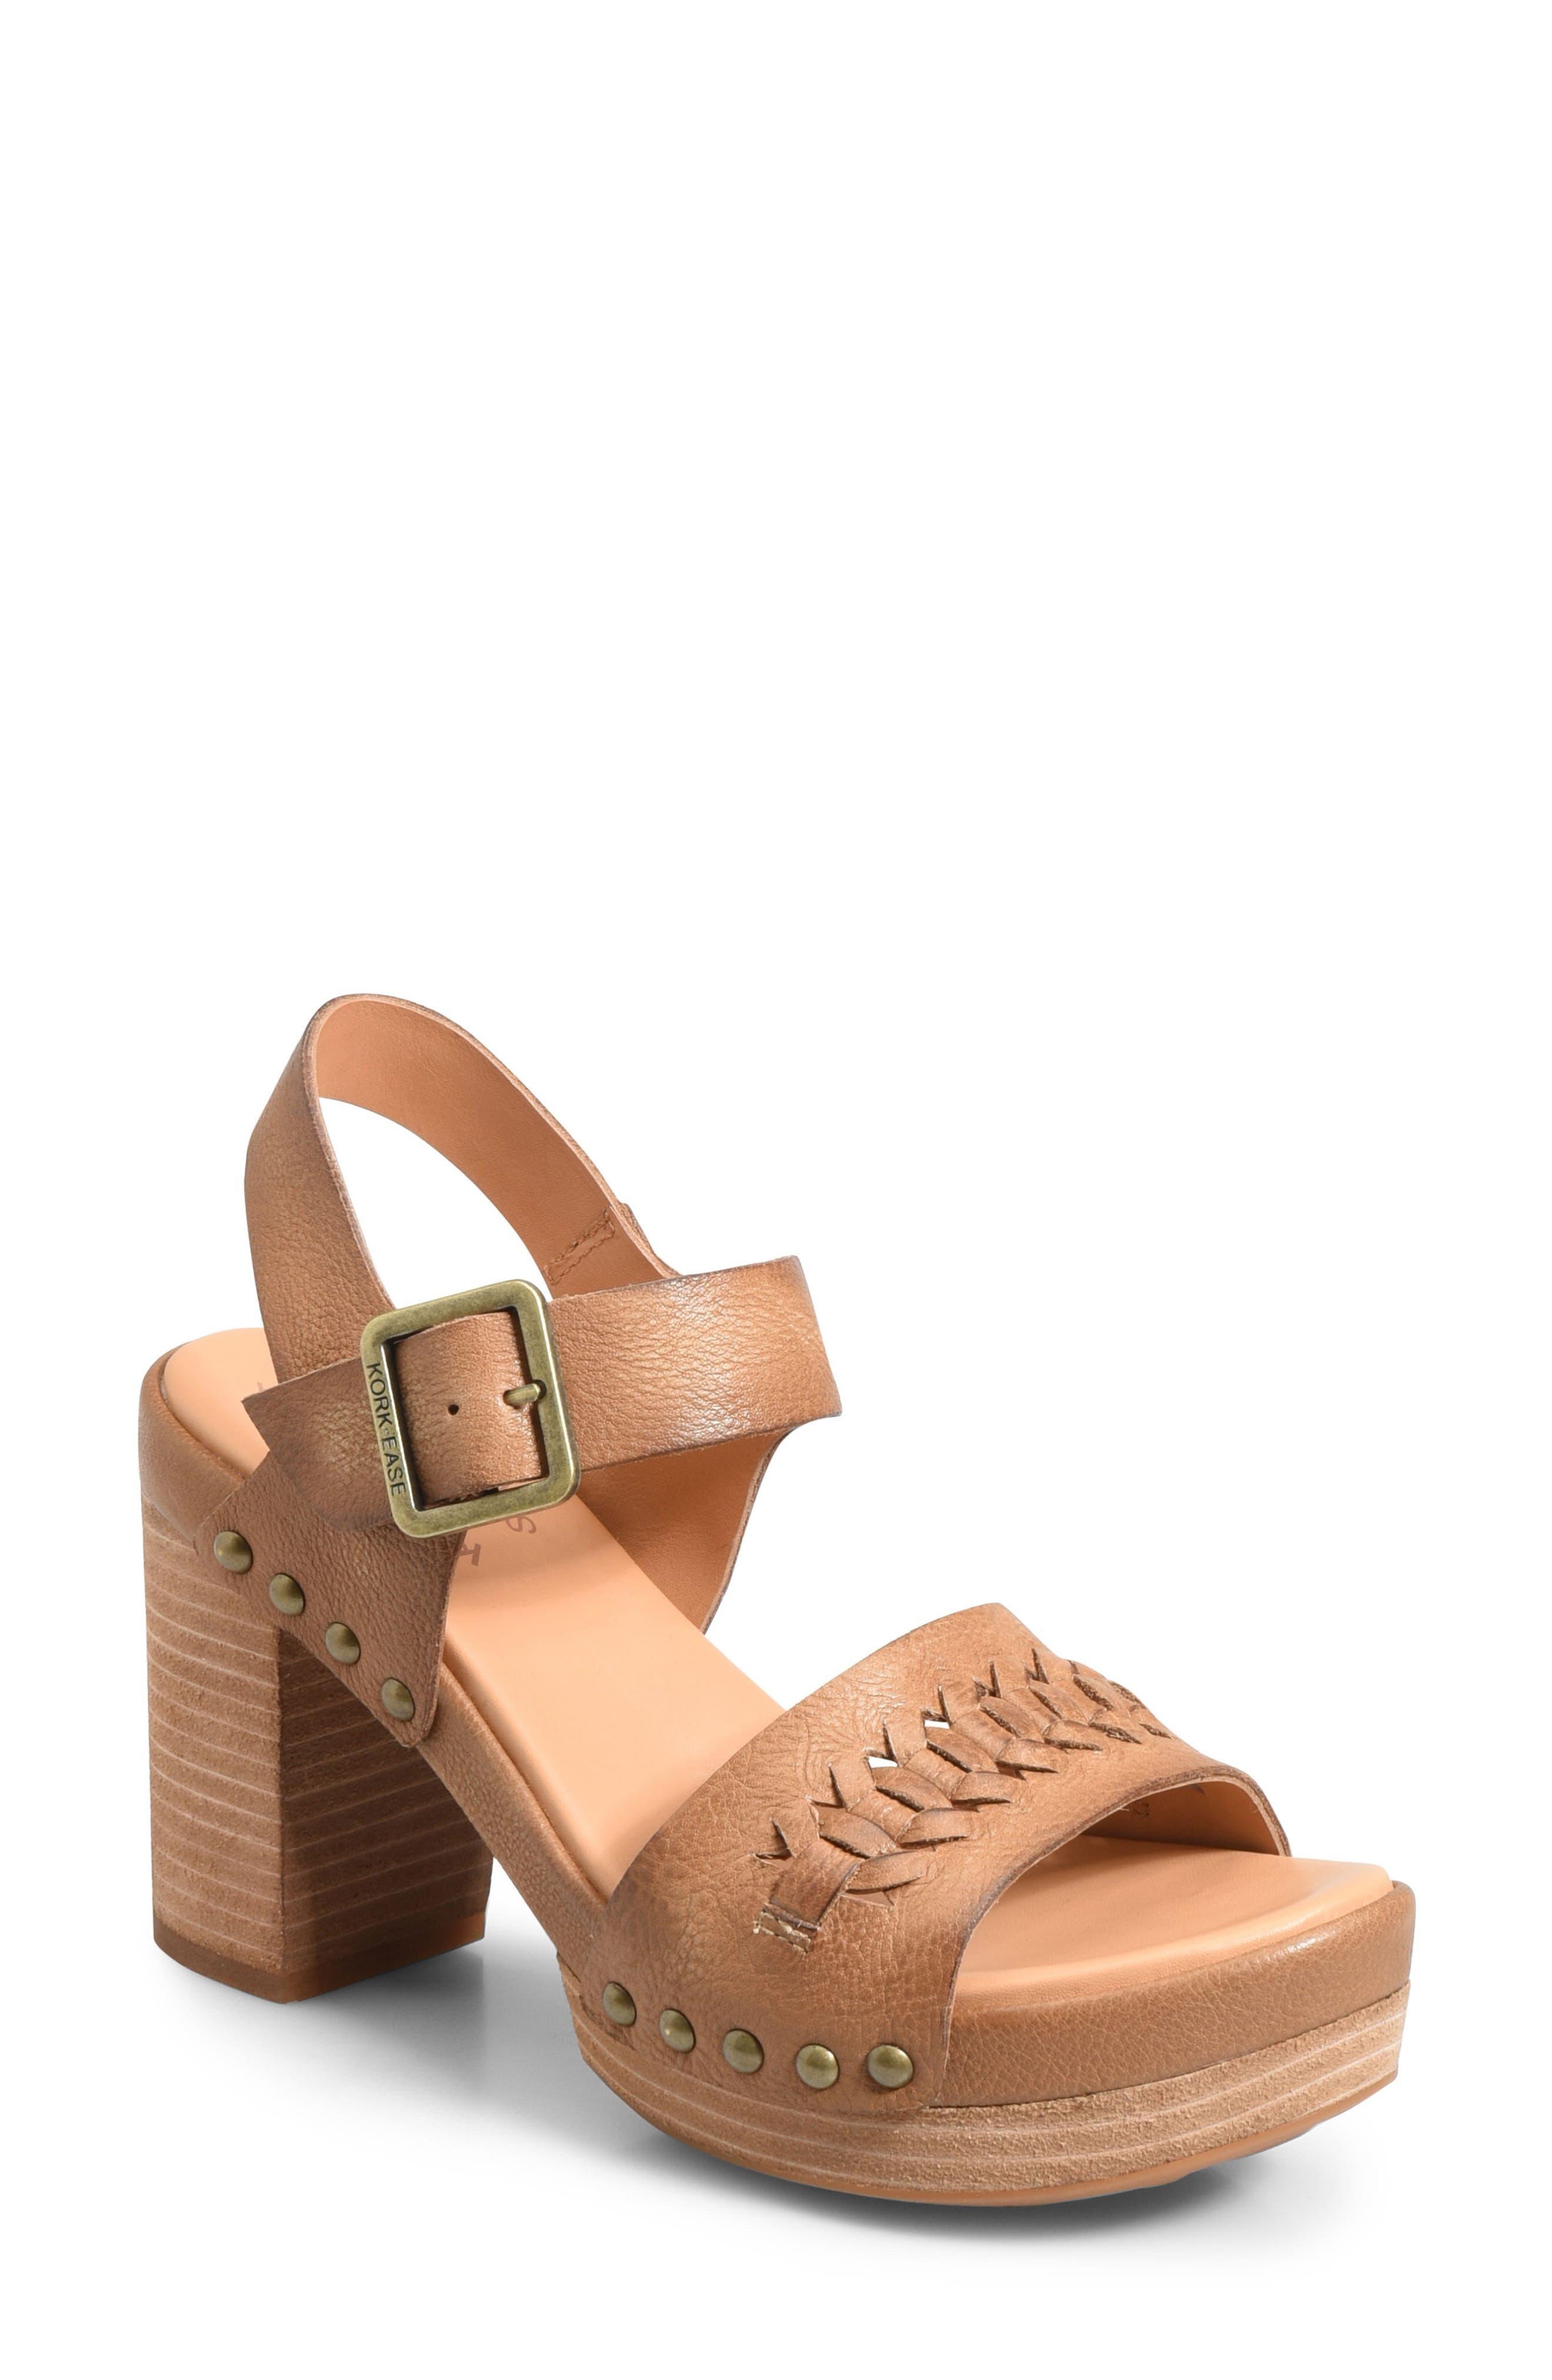 Pasilla Platform Sandal,                             Main thumbnail 1, color,                             Light Brown Leather